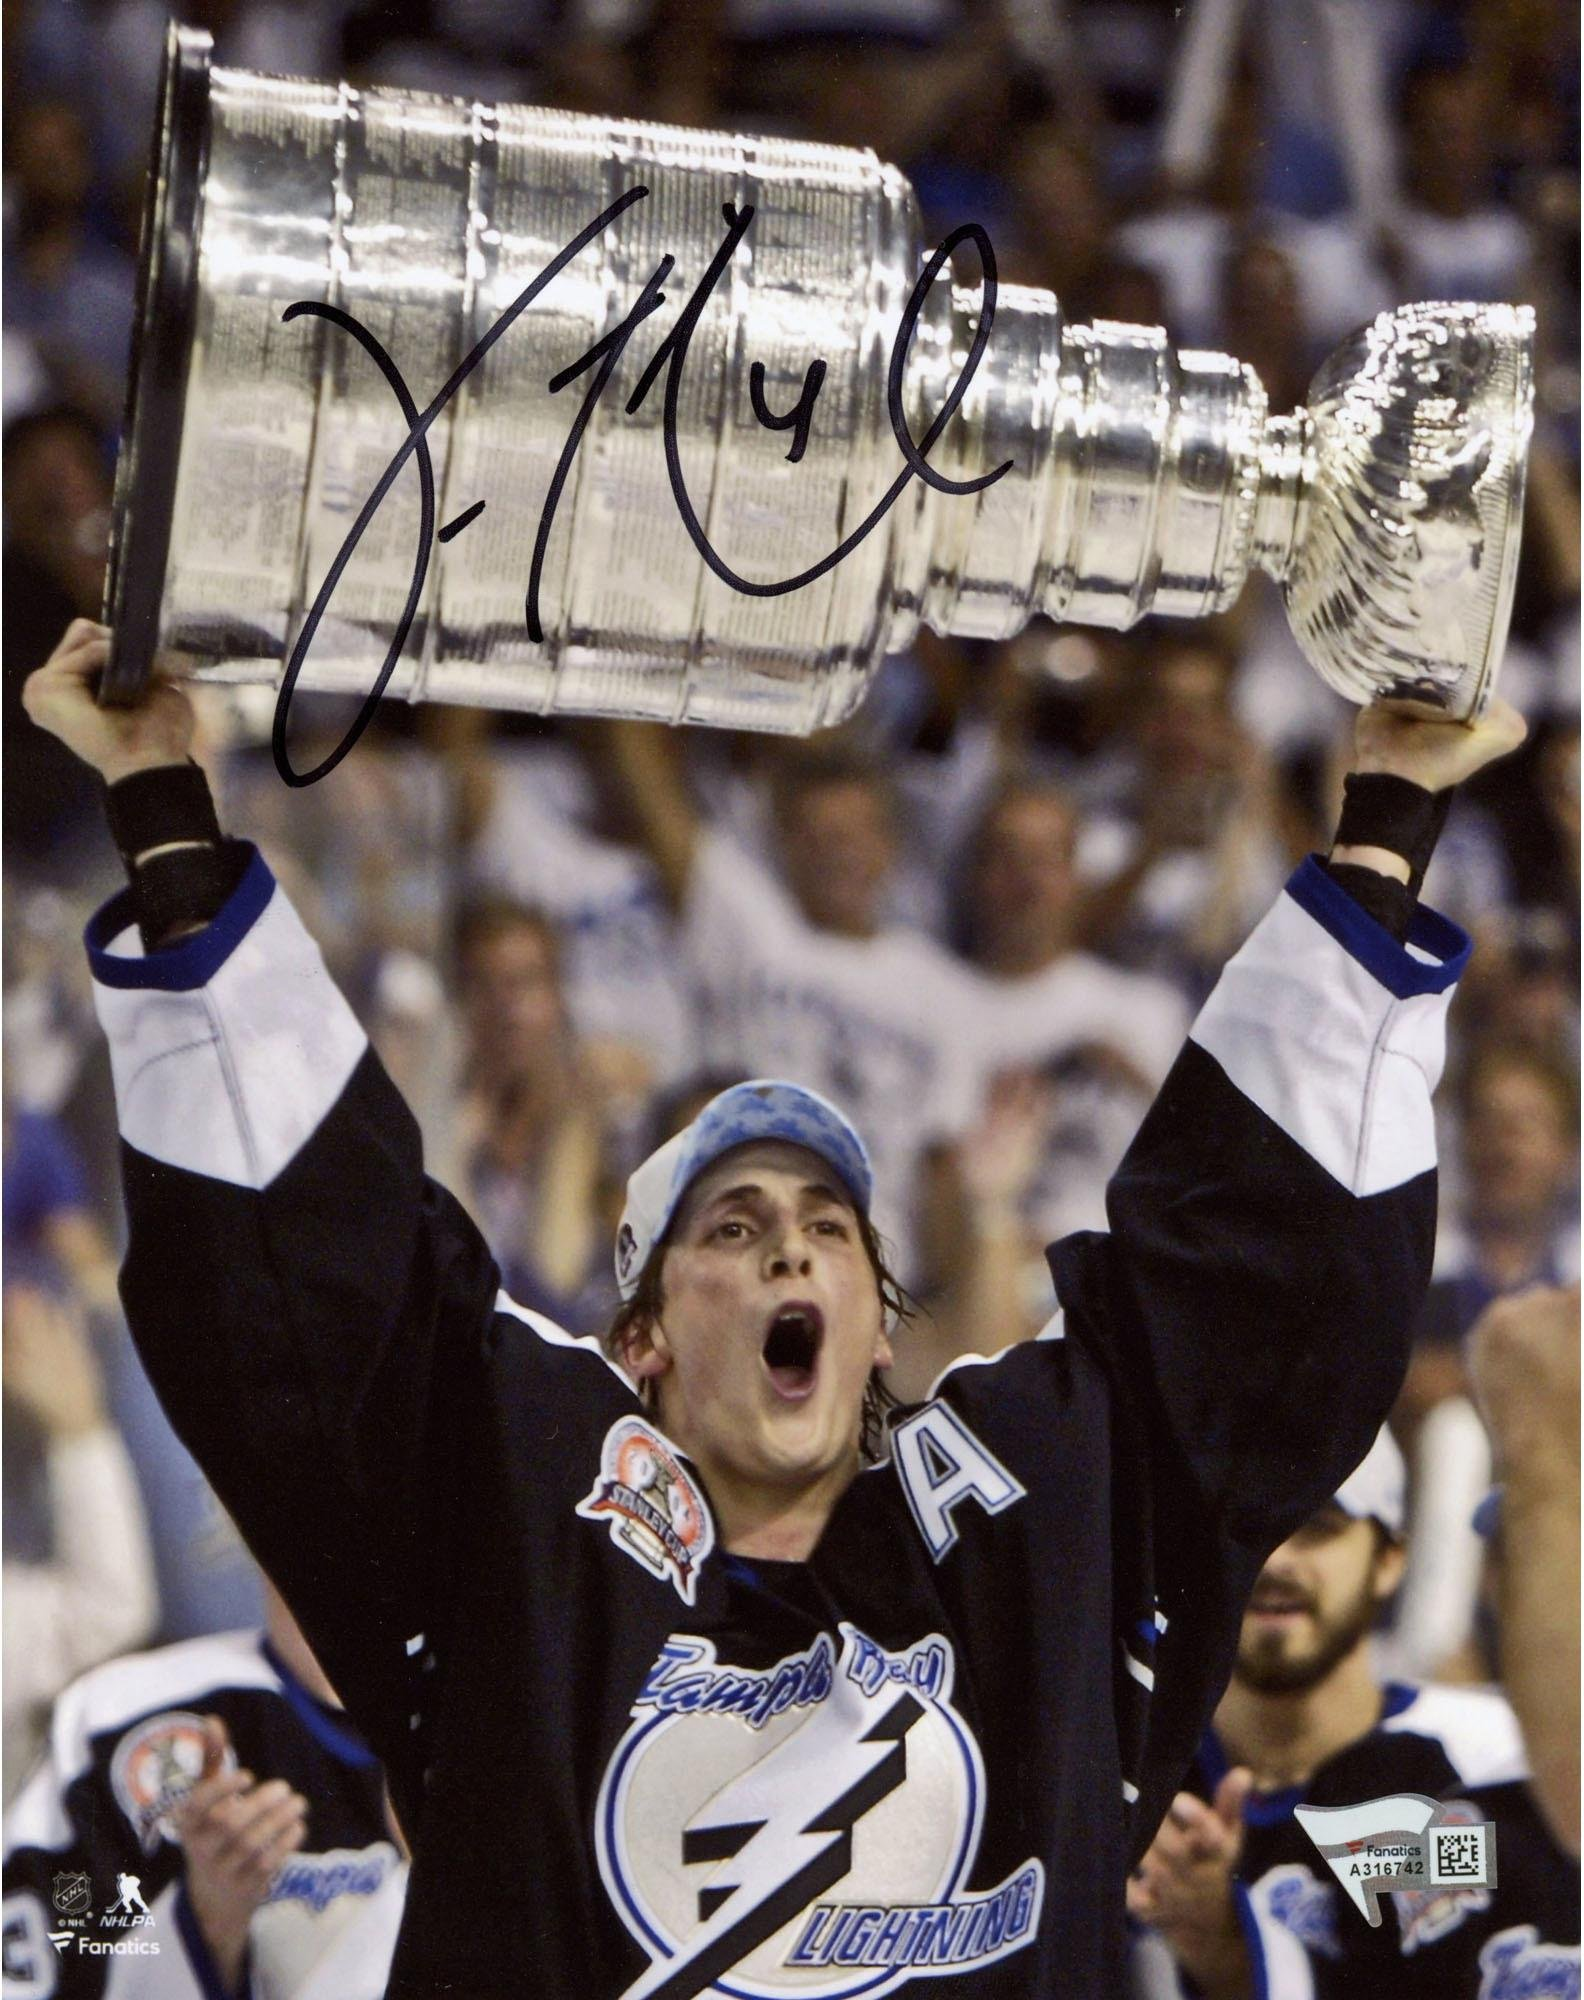 "Vincent Lecavalier Tampa Bay Lightning Autographed 8"" x 10"" Raising Cup Photograph Fanatics Authentic Certified"